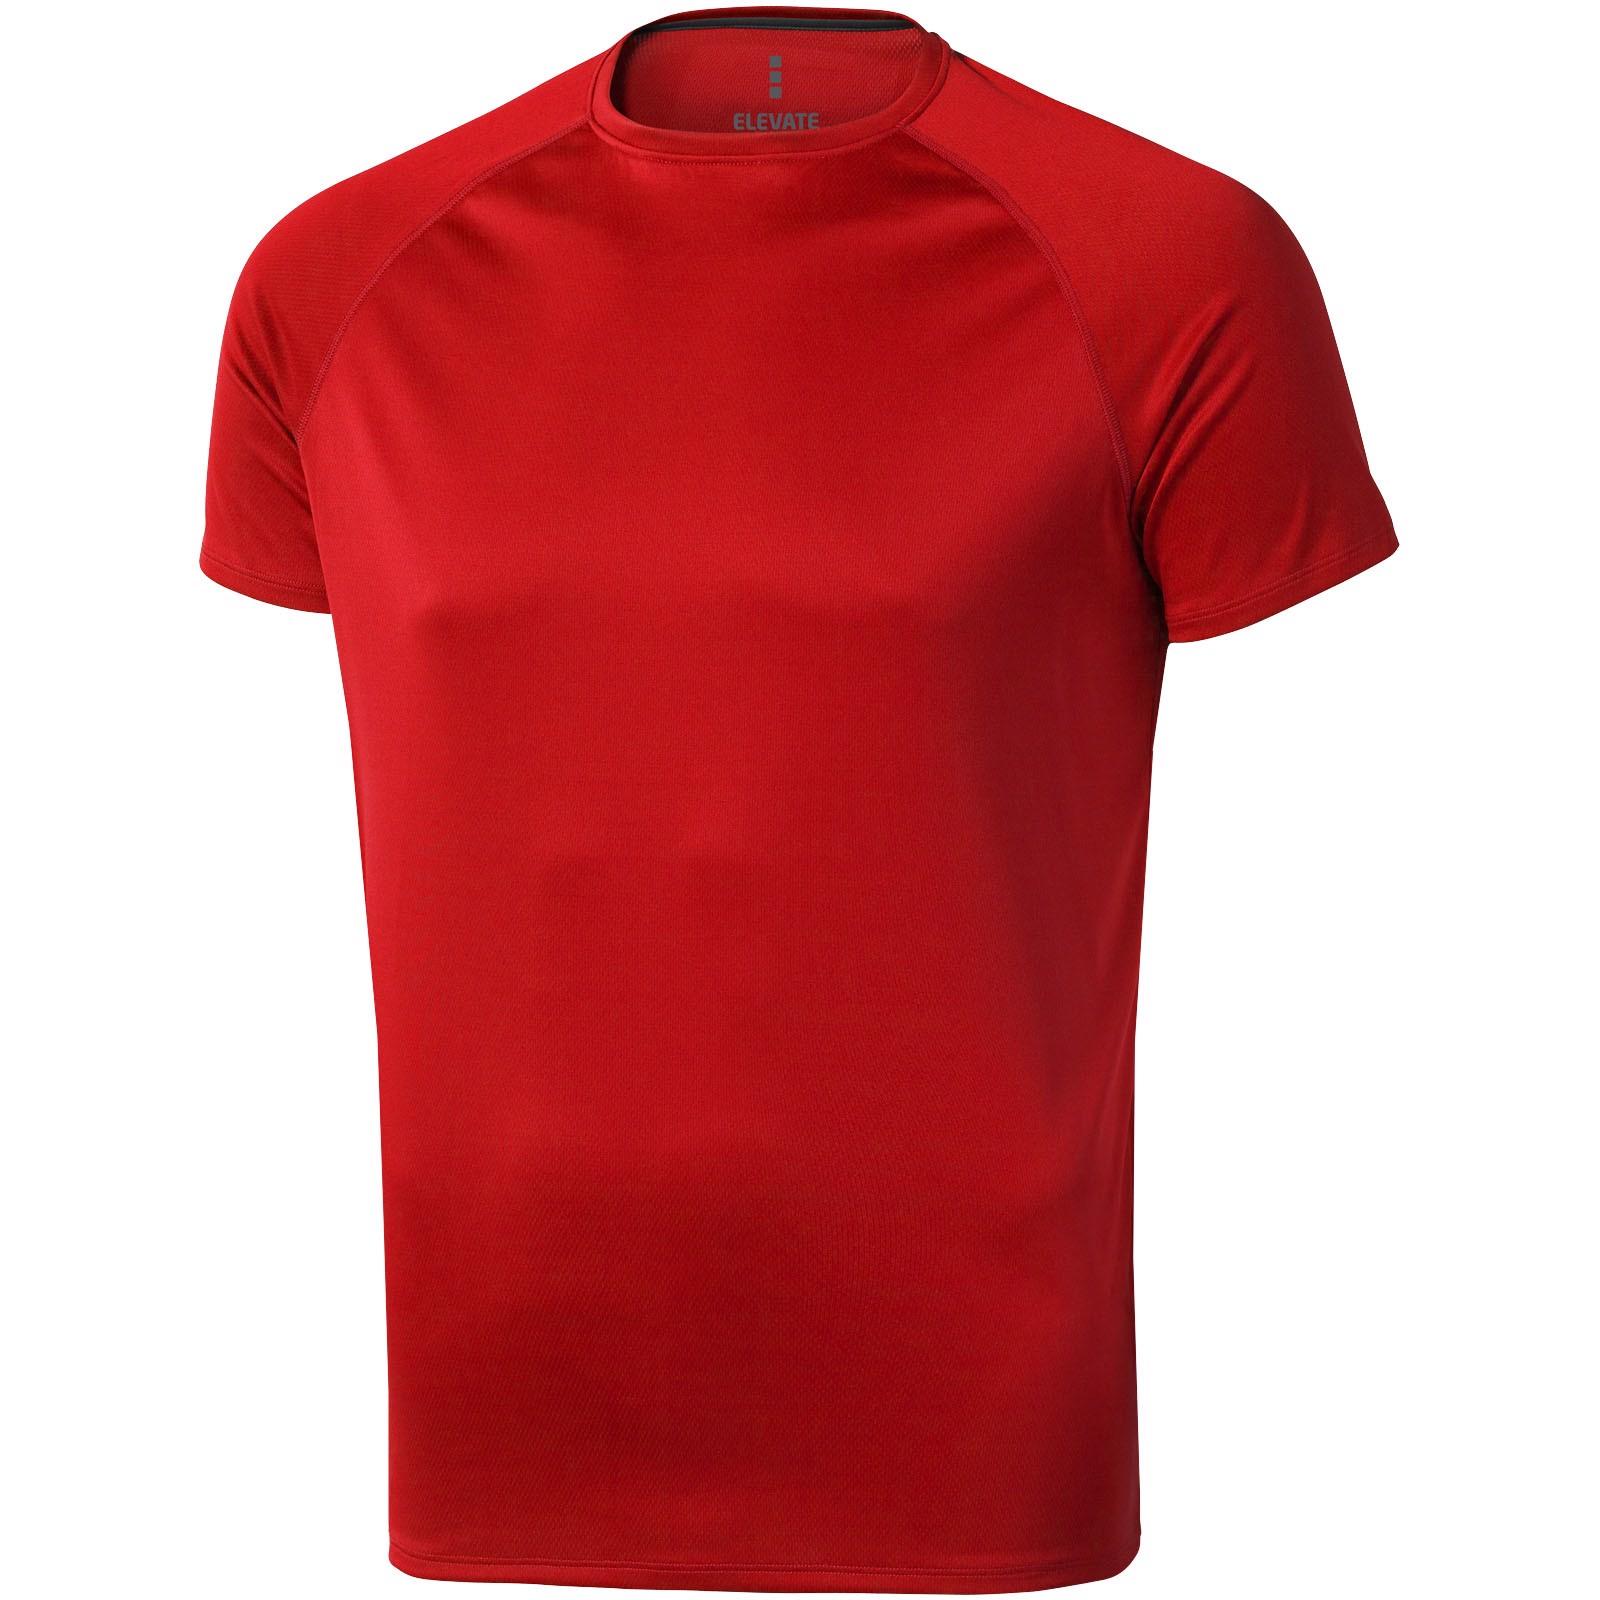 Niagara short sleeve men's cool fit t-shirt - Red / S